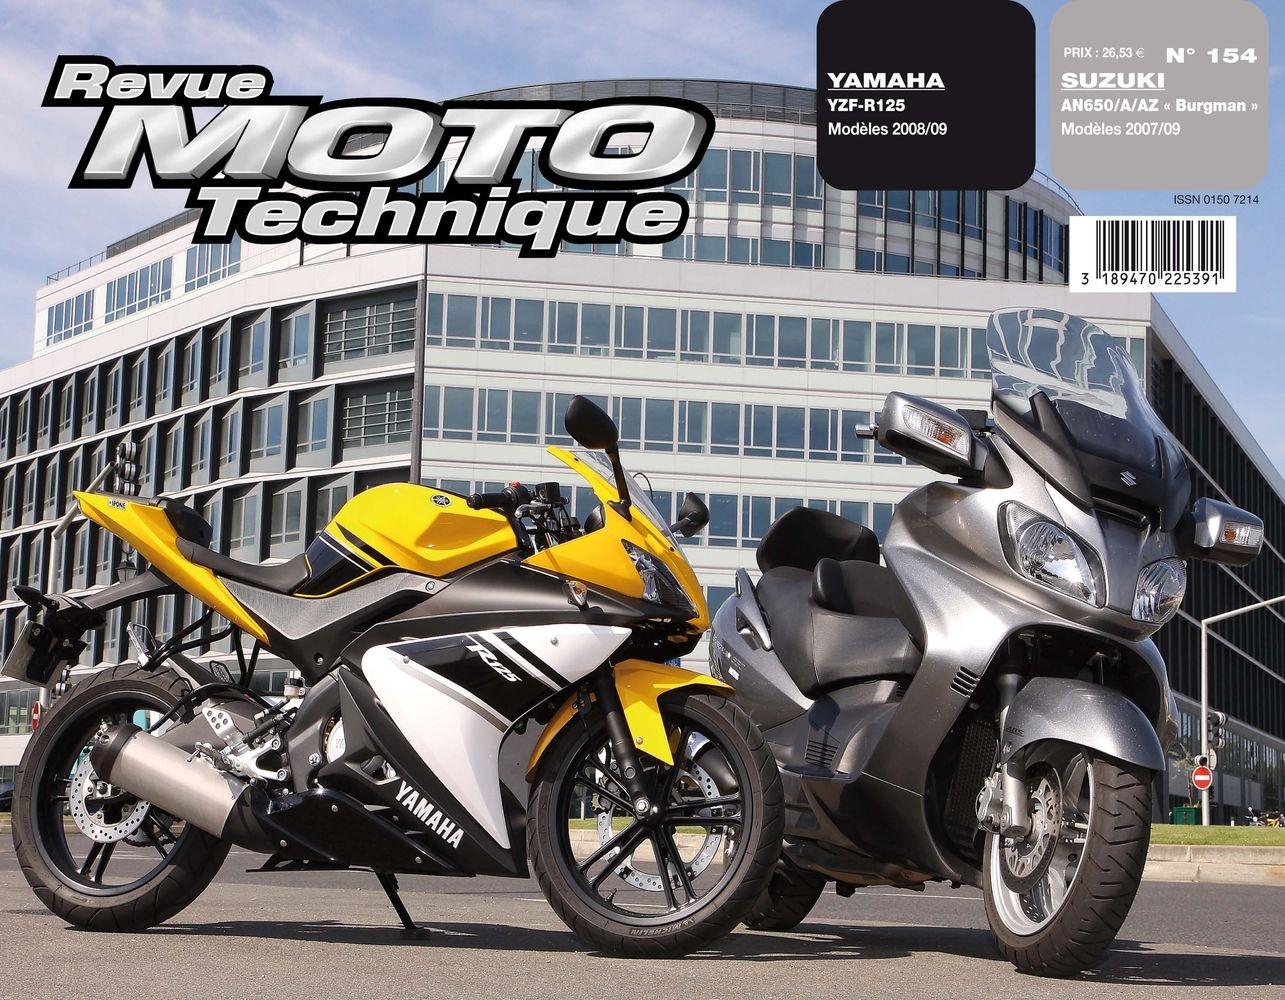 Revue Moto Technique 154.1 Suzuki 650 Burgman 07-09 / Yamaha YZF-R 125